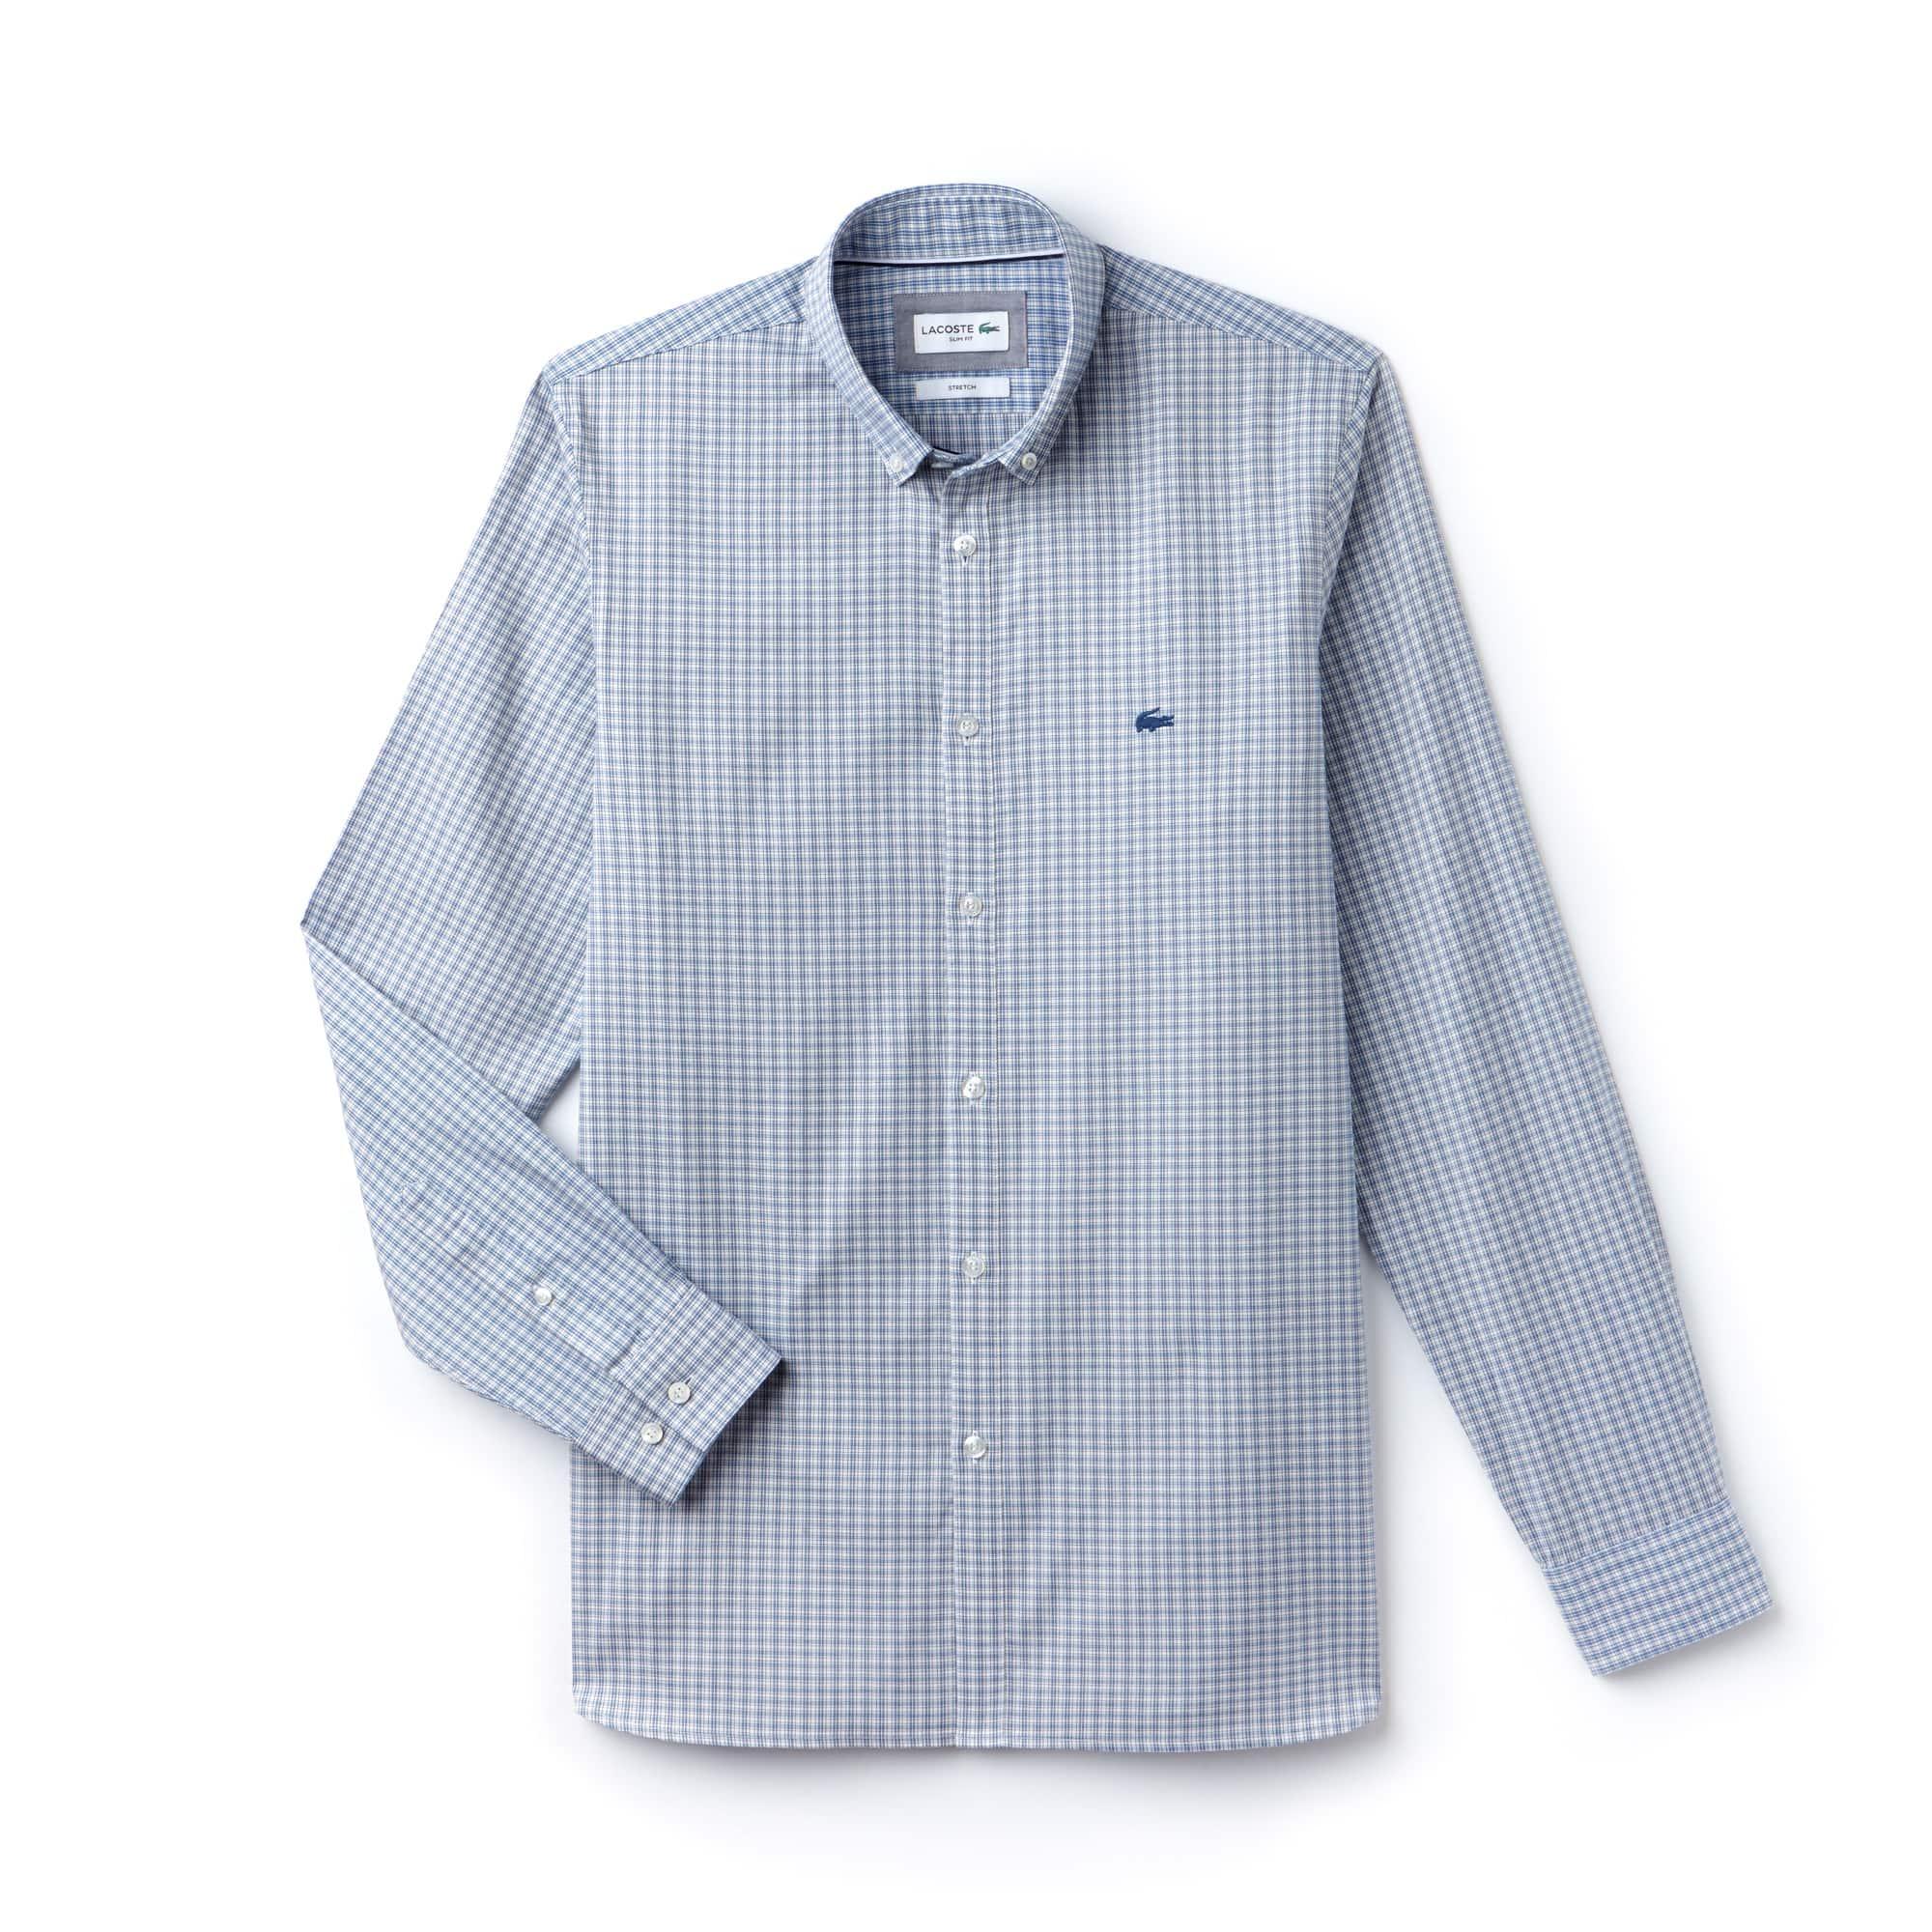 Men's Slim Fit Check Stretch Pinpoint Cotton Shirt